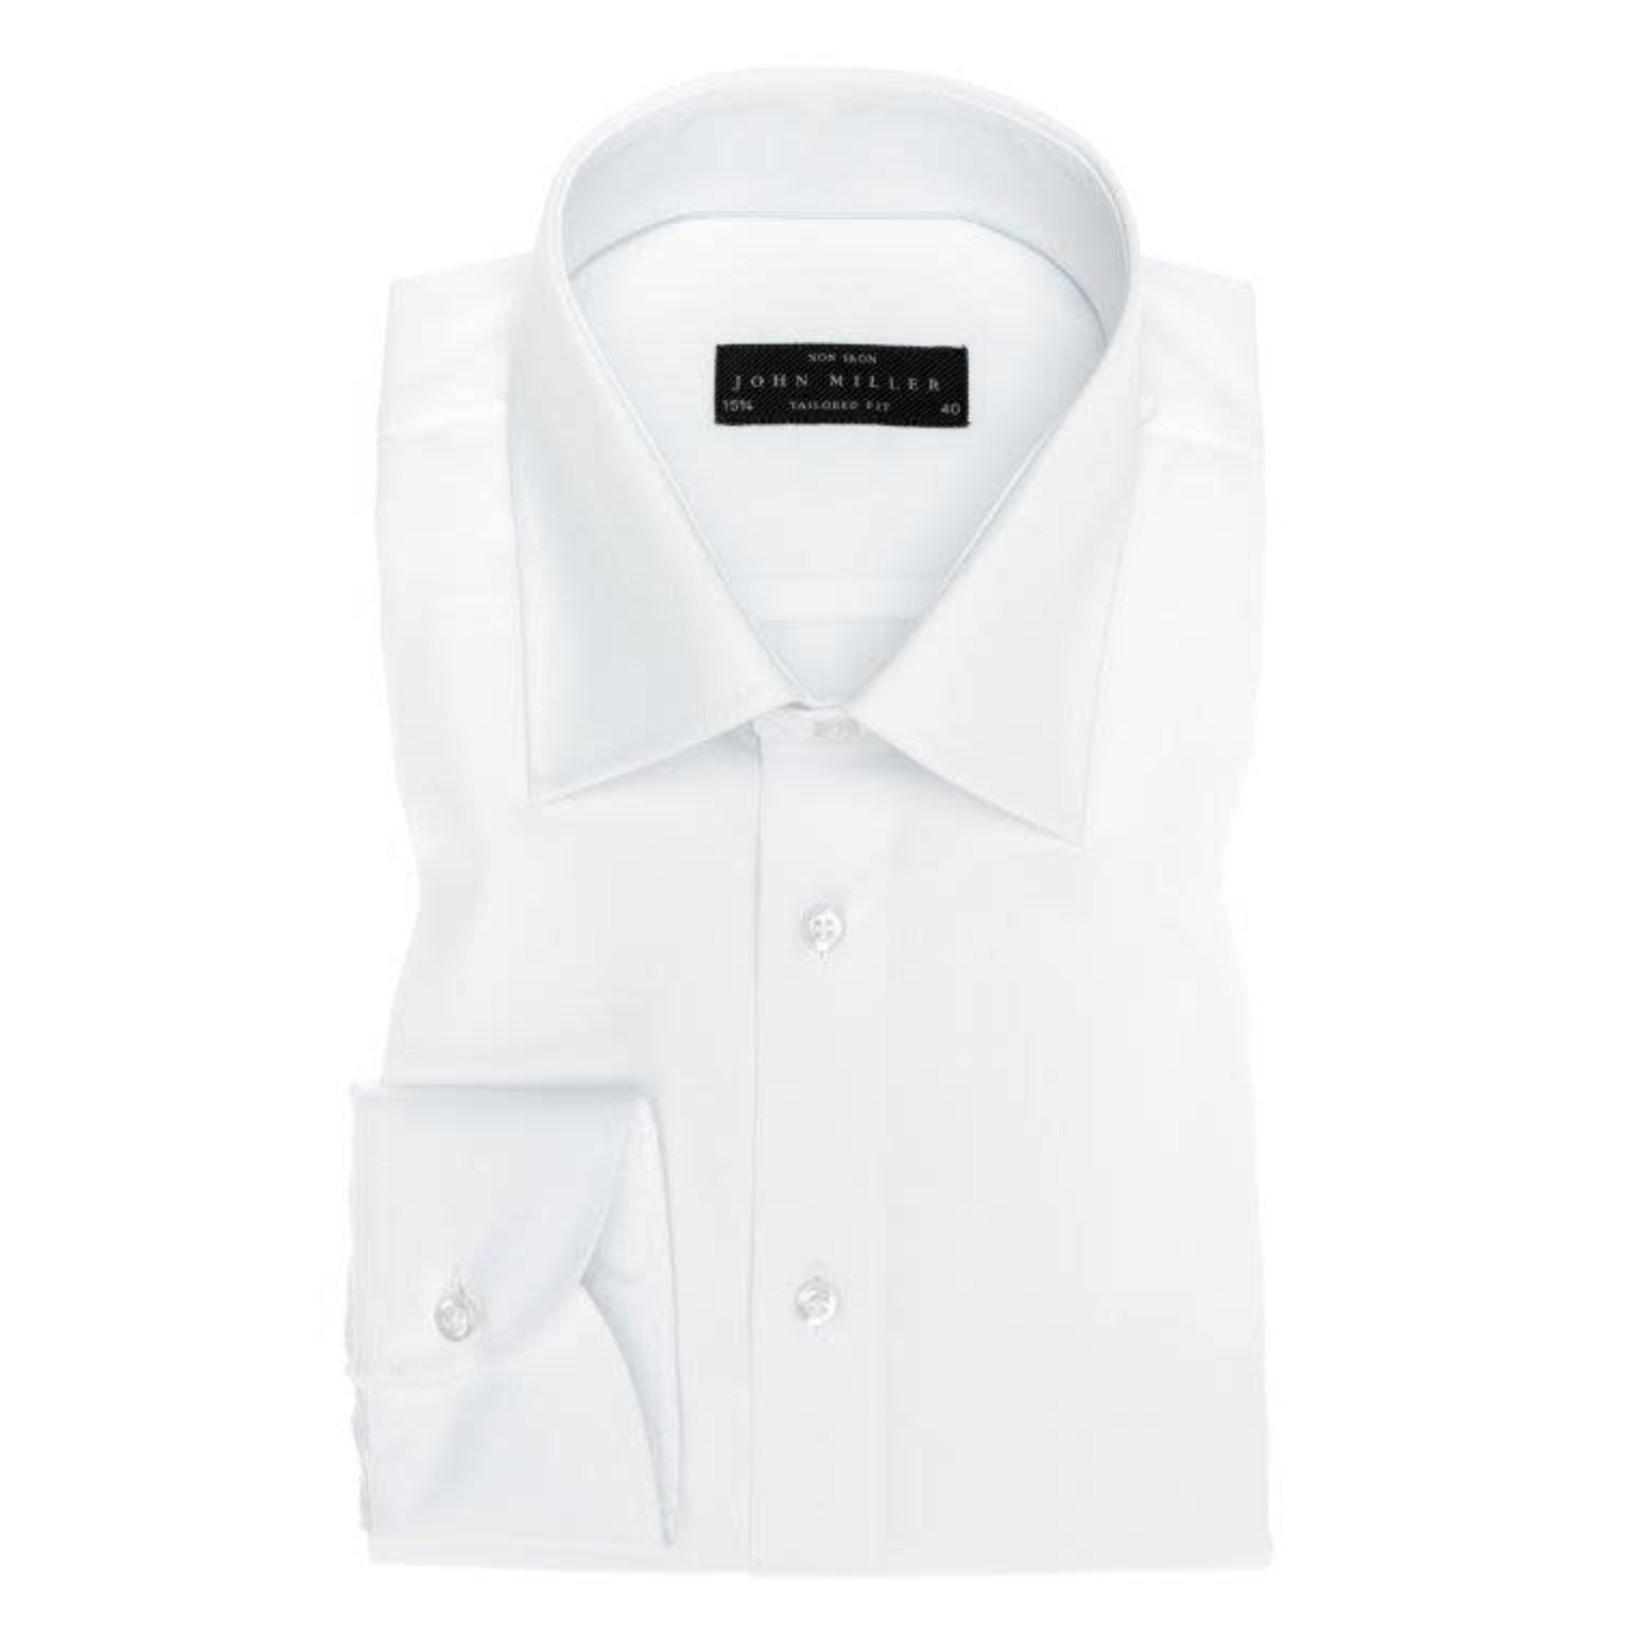 John Miller tailored fit overhemd wit met semi spread boord